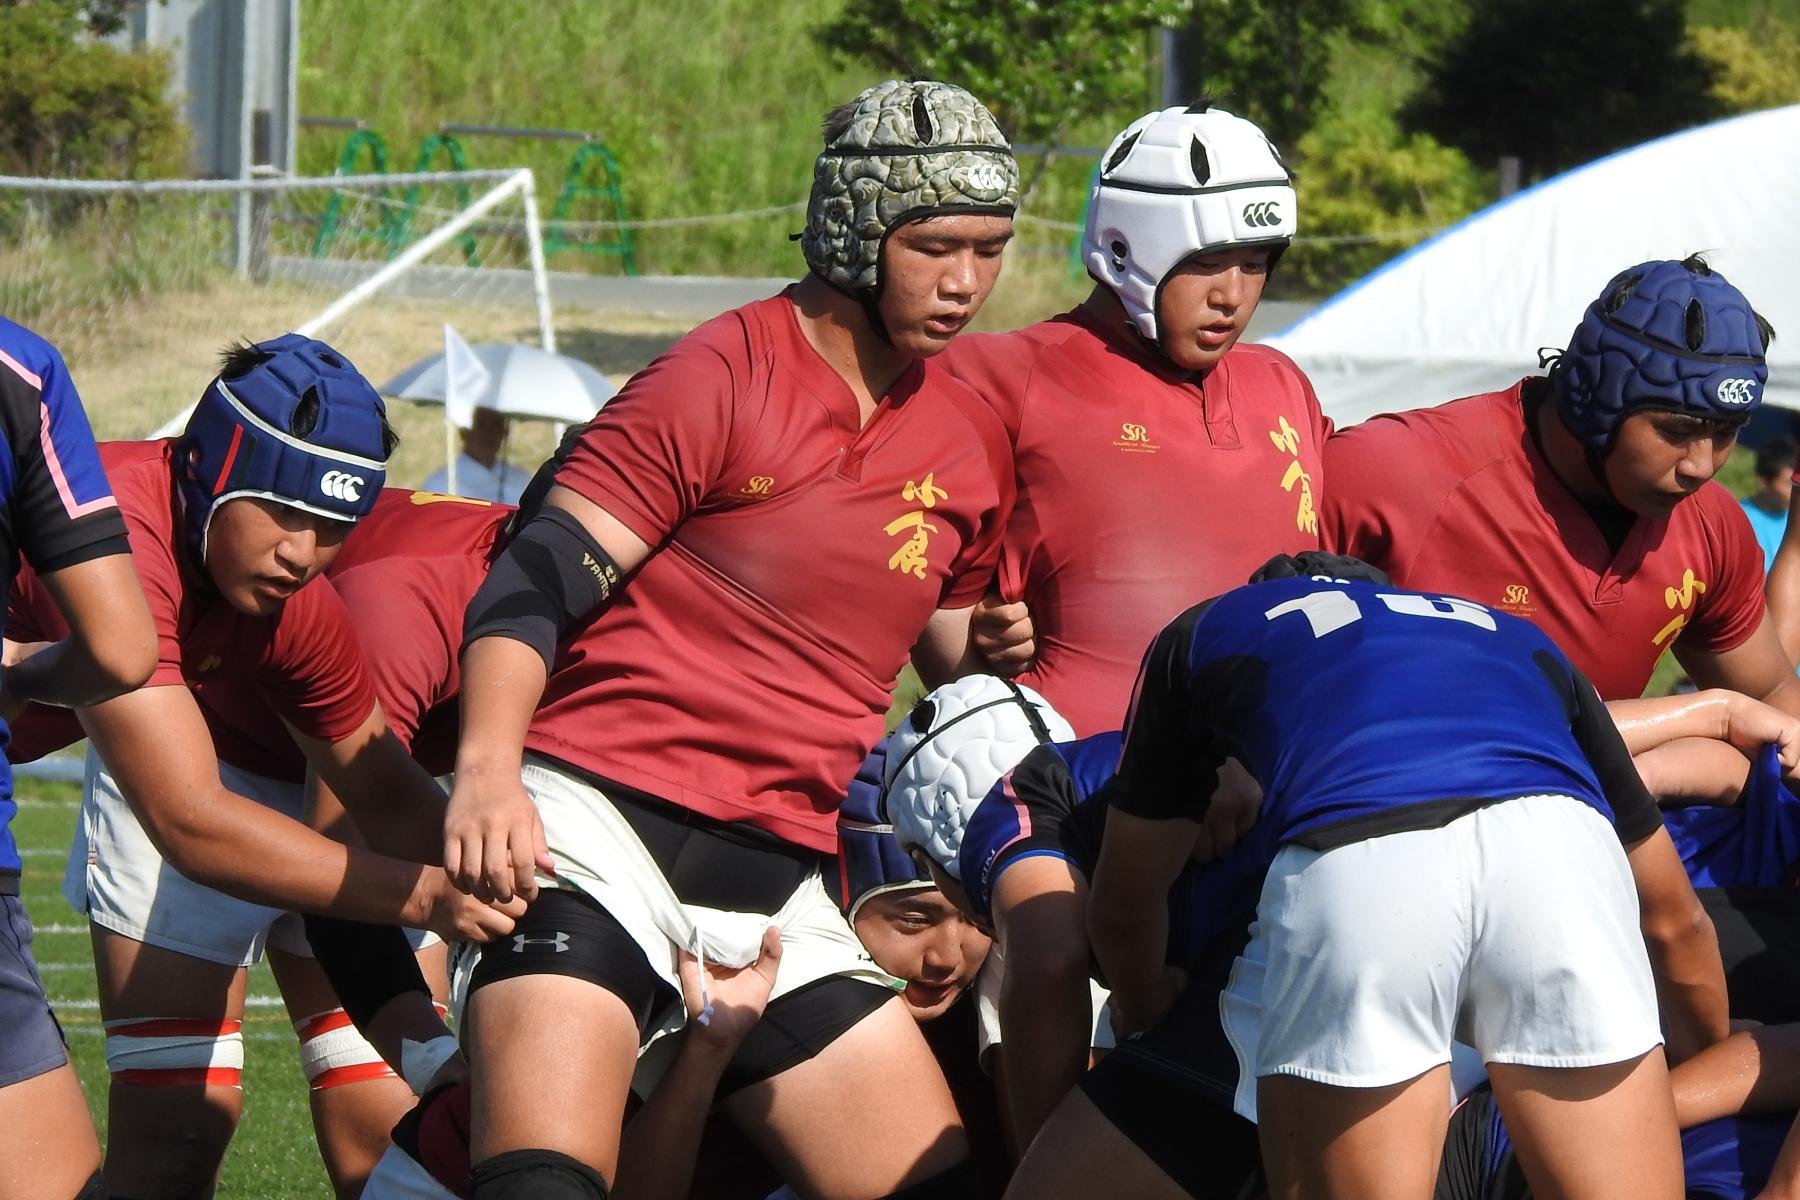 http://kokura-rugby.sakura.ne.jp/180807_161600_0028.jpg